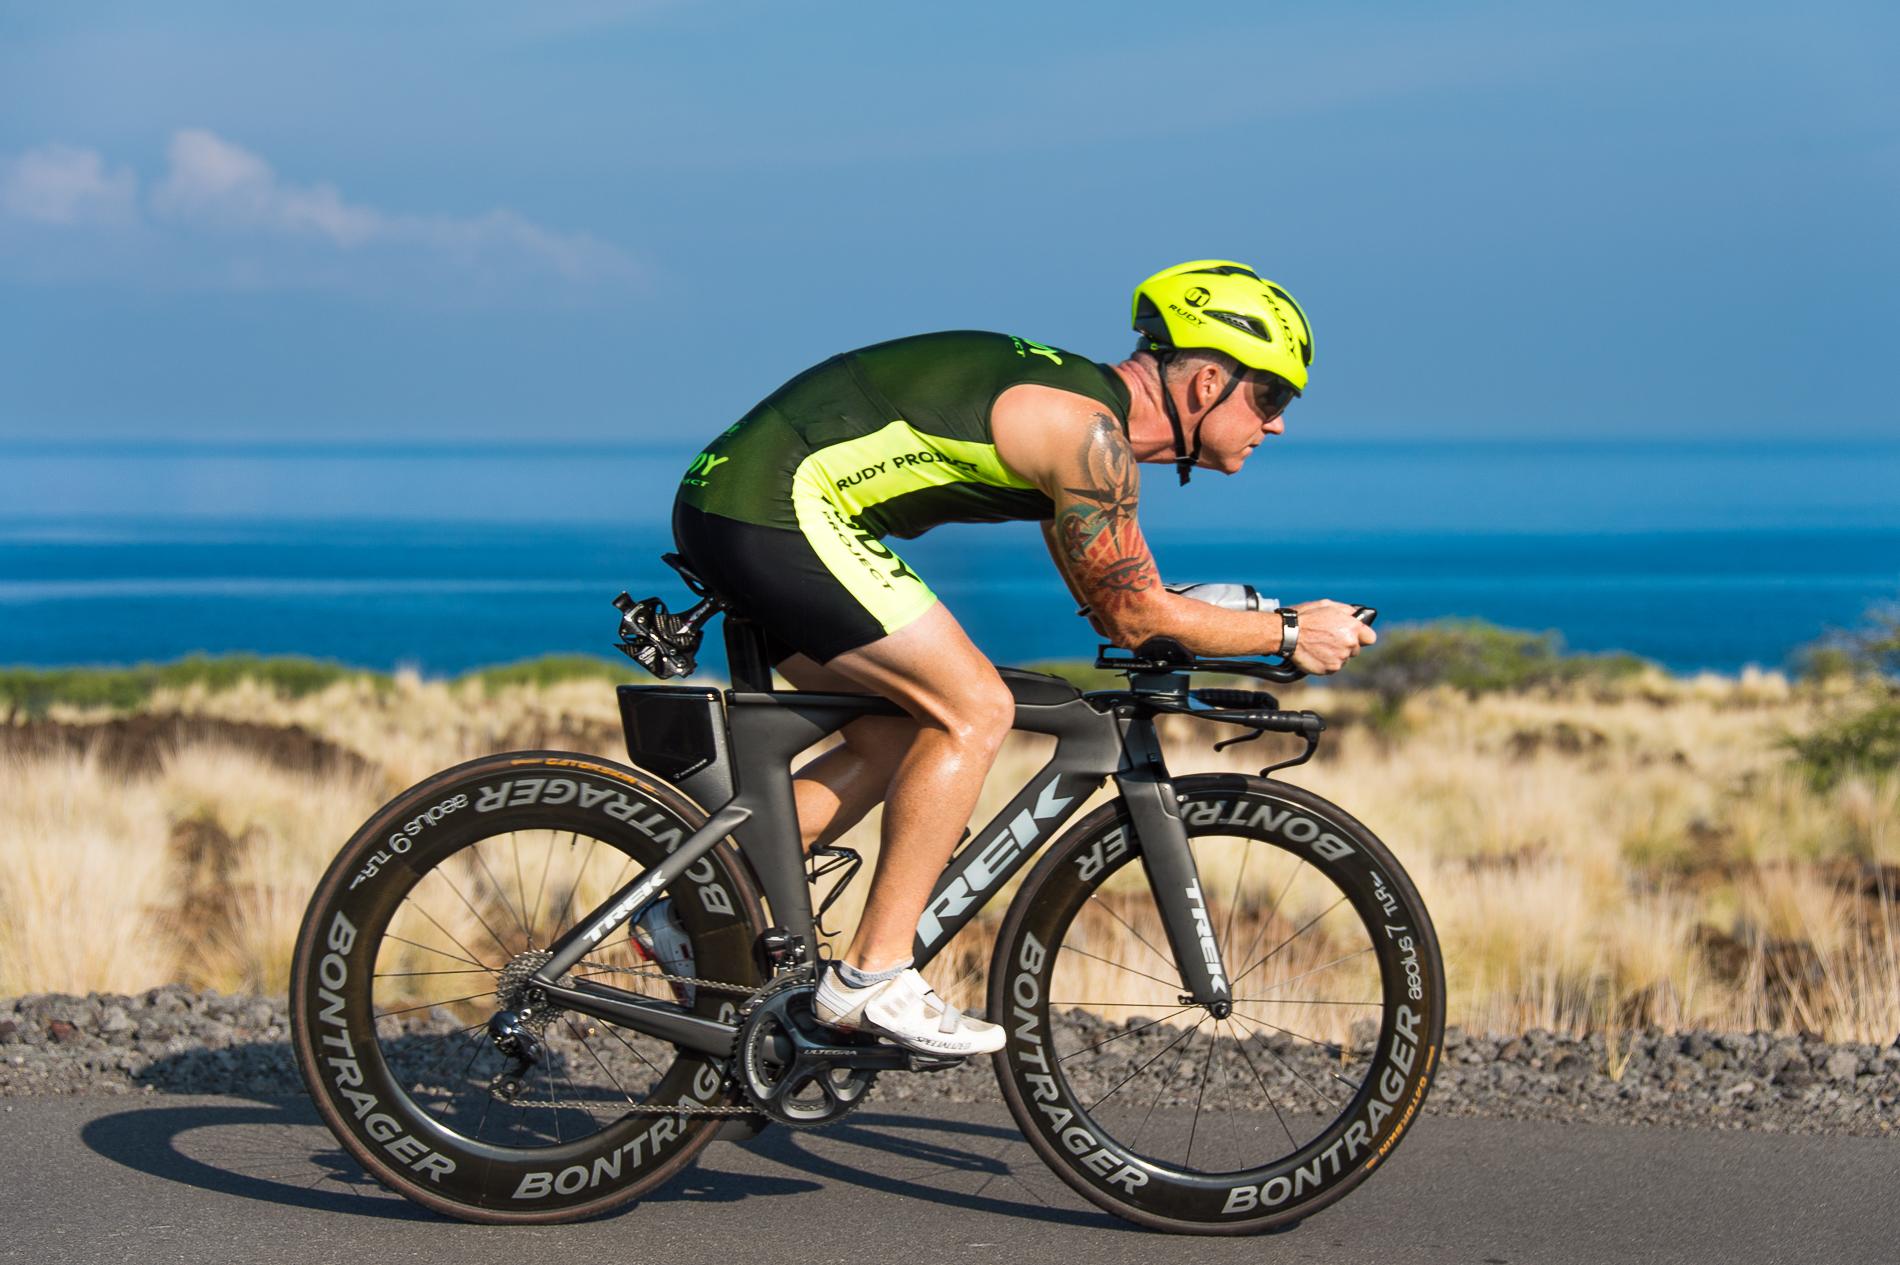 Ironman Triathlon Bike